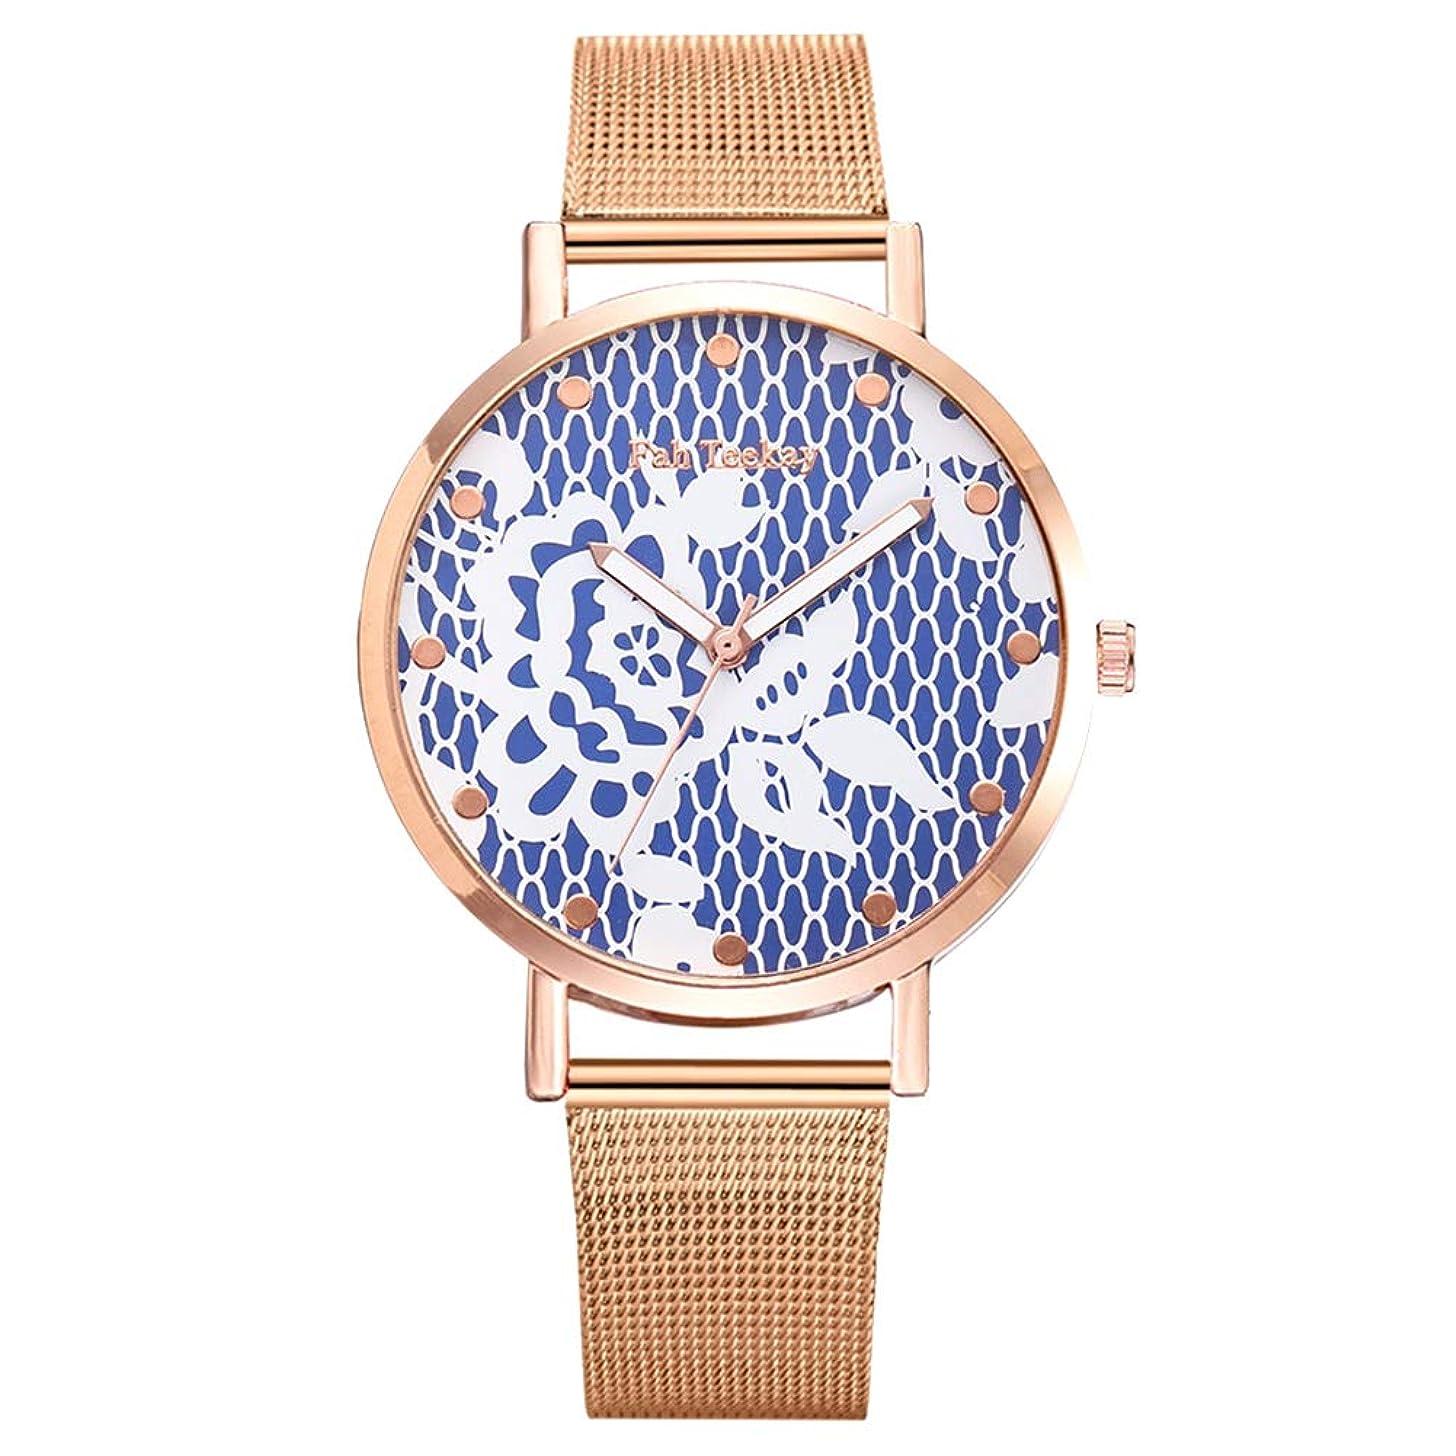 lightclub Fashion Women Flower Print No Numbers Mesh Band Analog Quartz Wrist Watch Gift for Women Men Blue